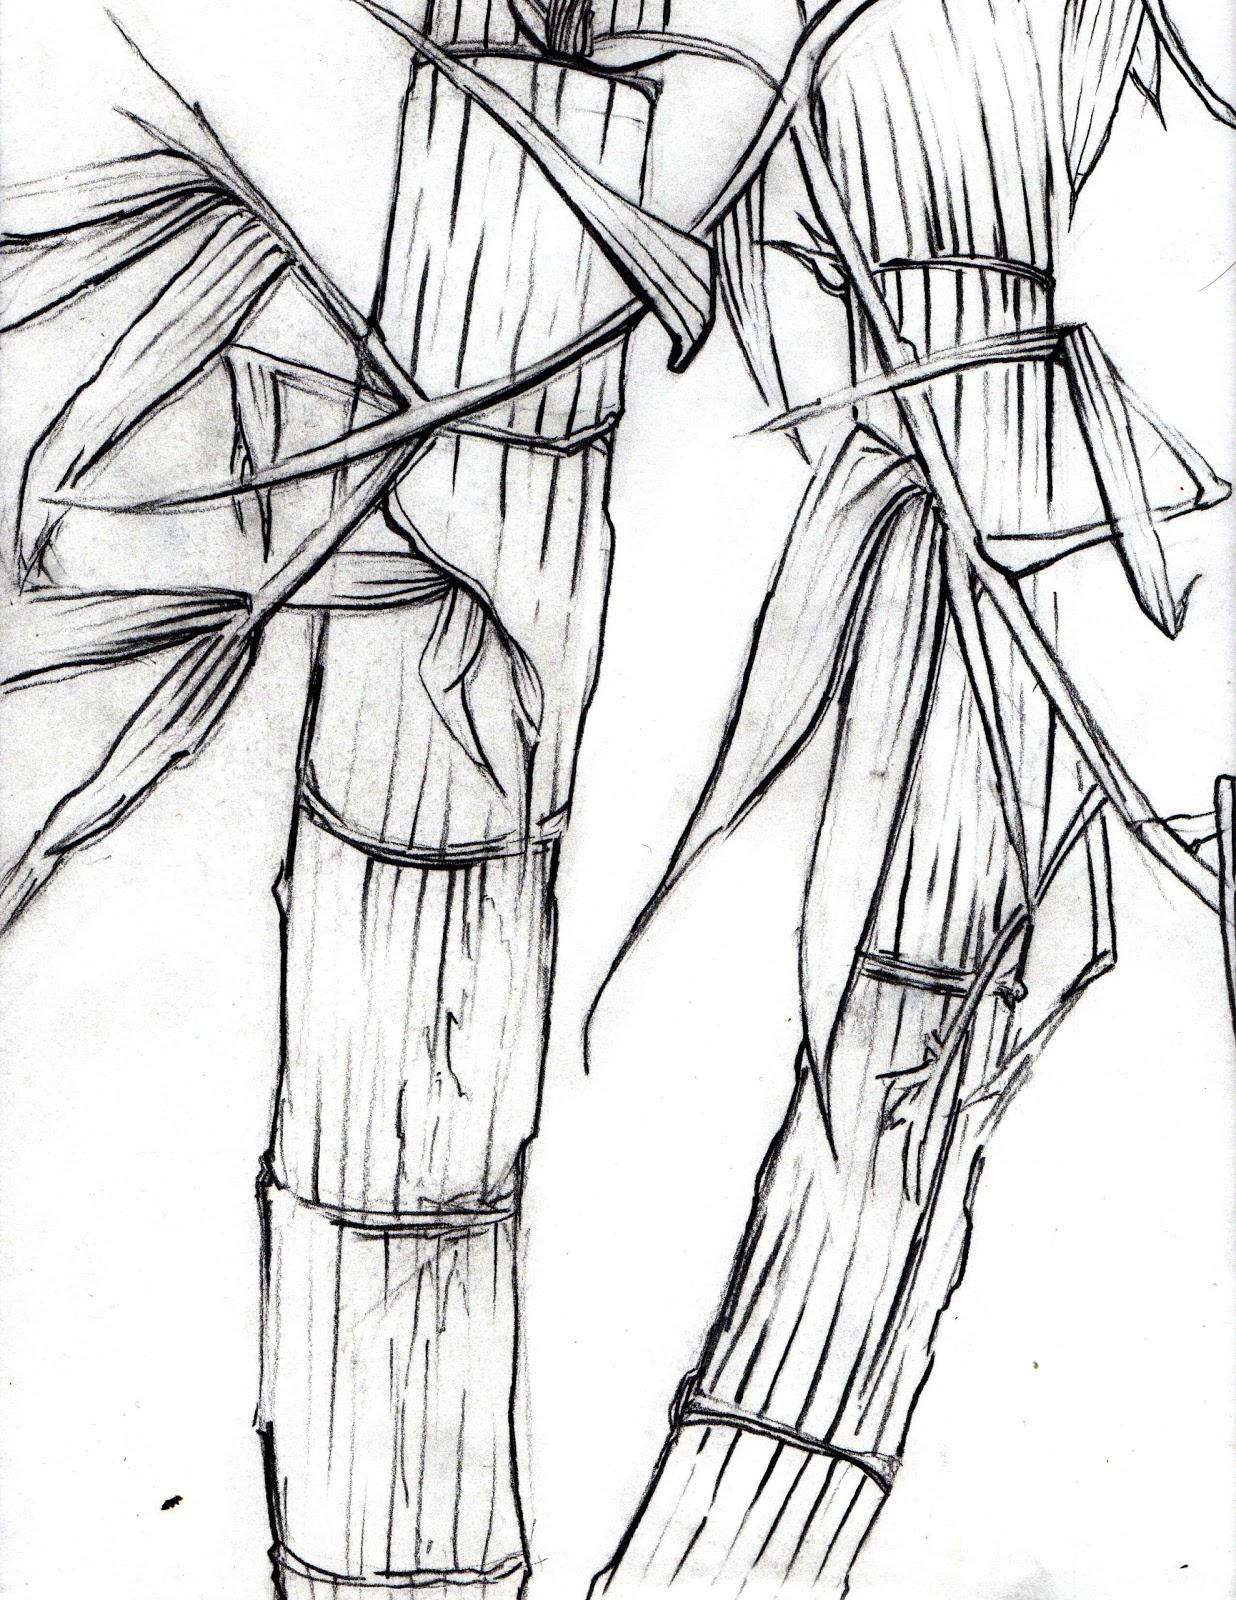 1236x1600 Bamboo Grove Photo Bamboo Drawing